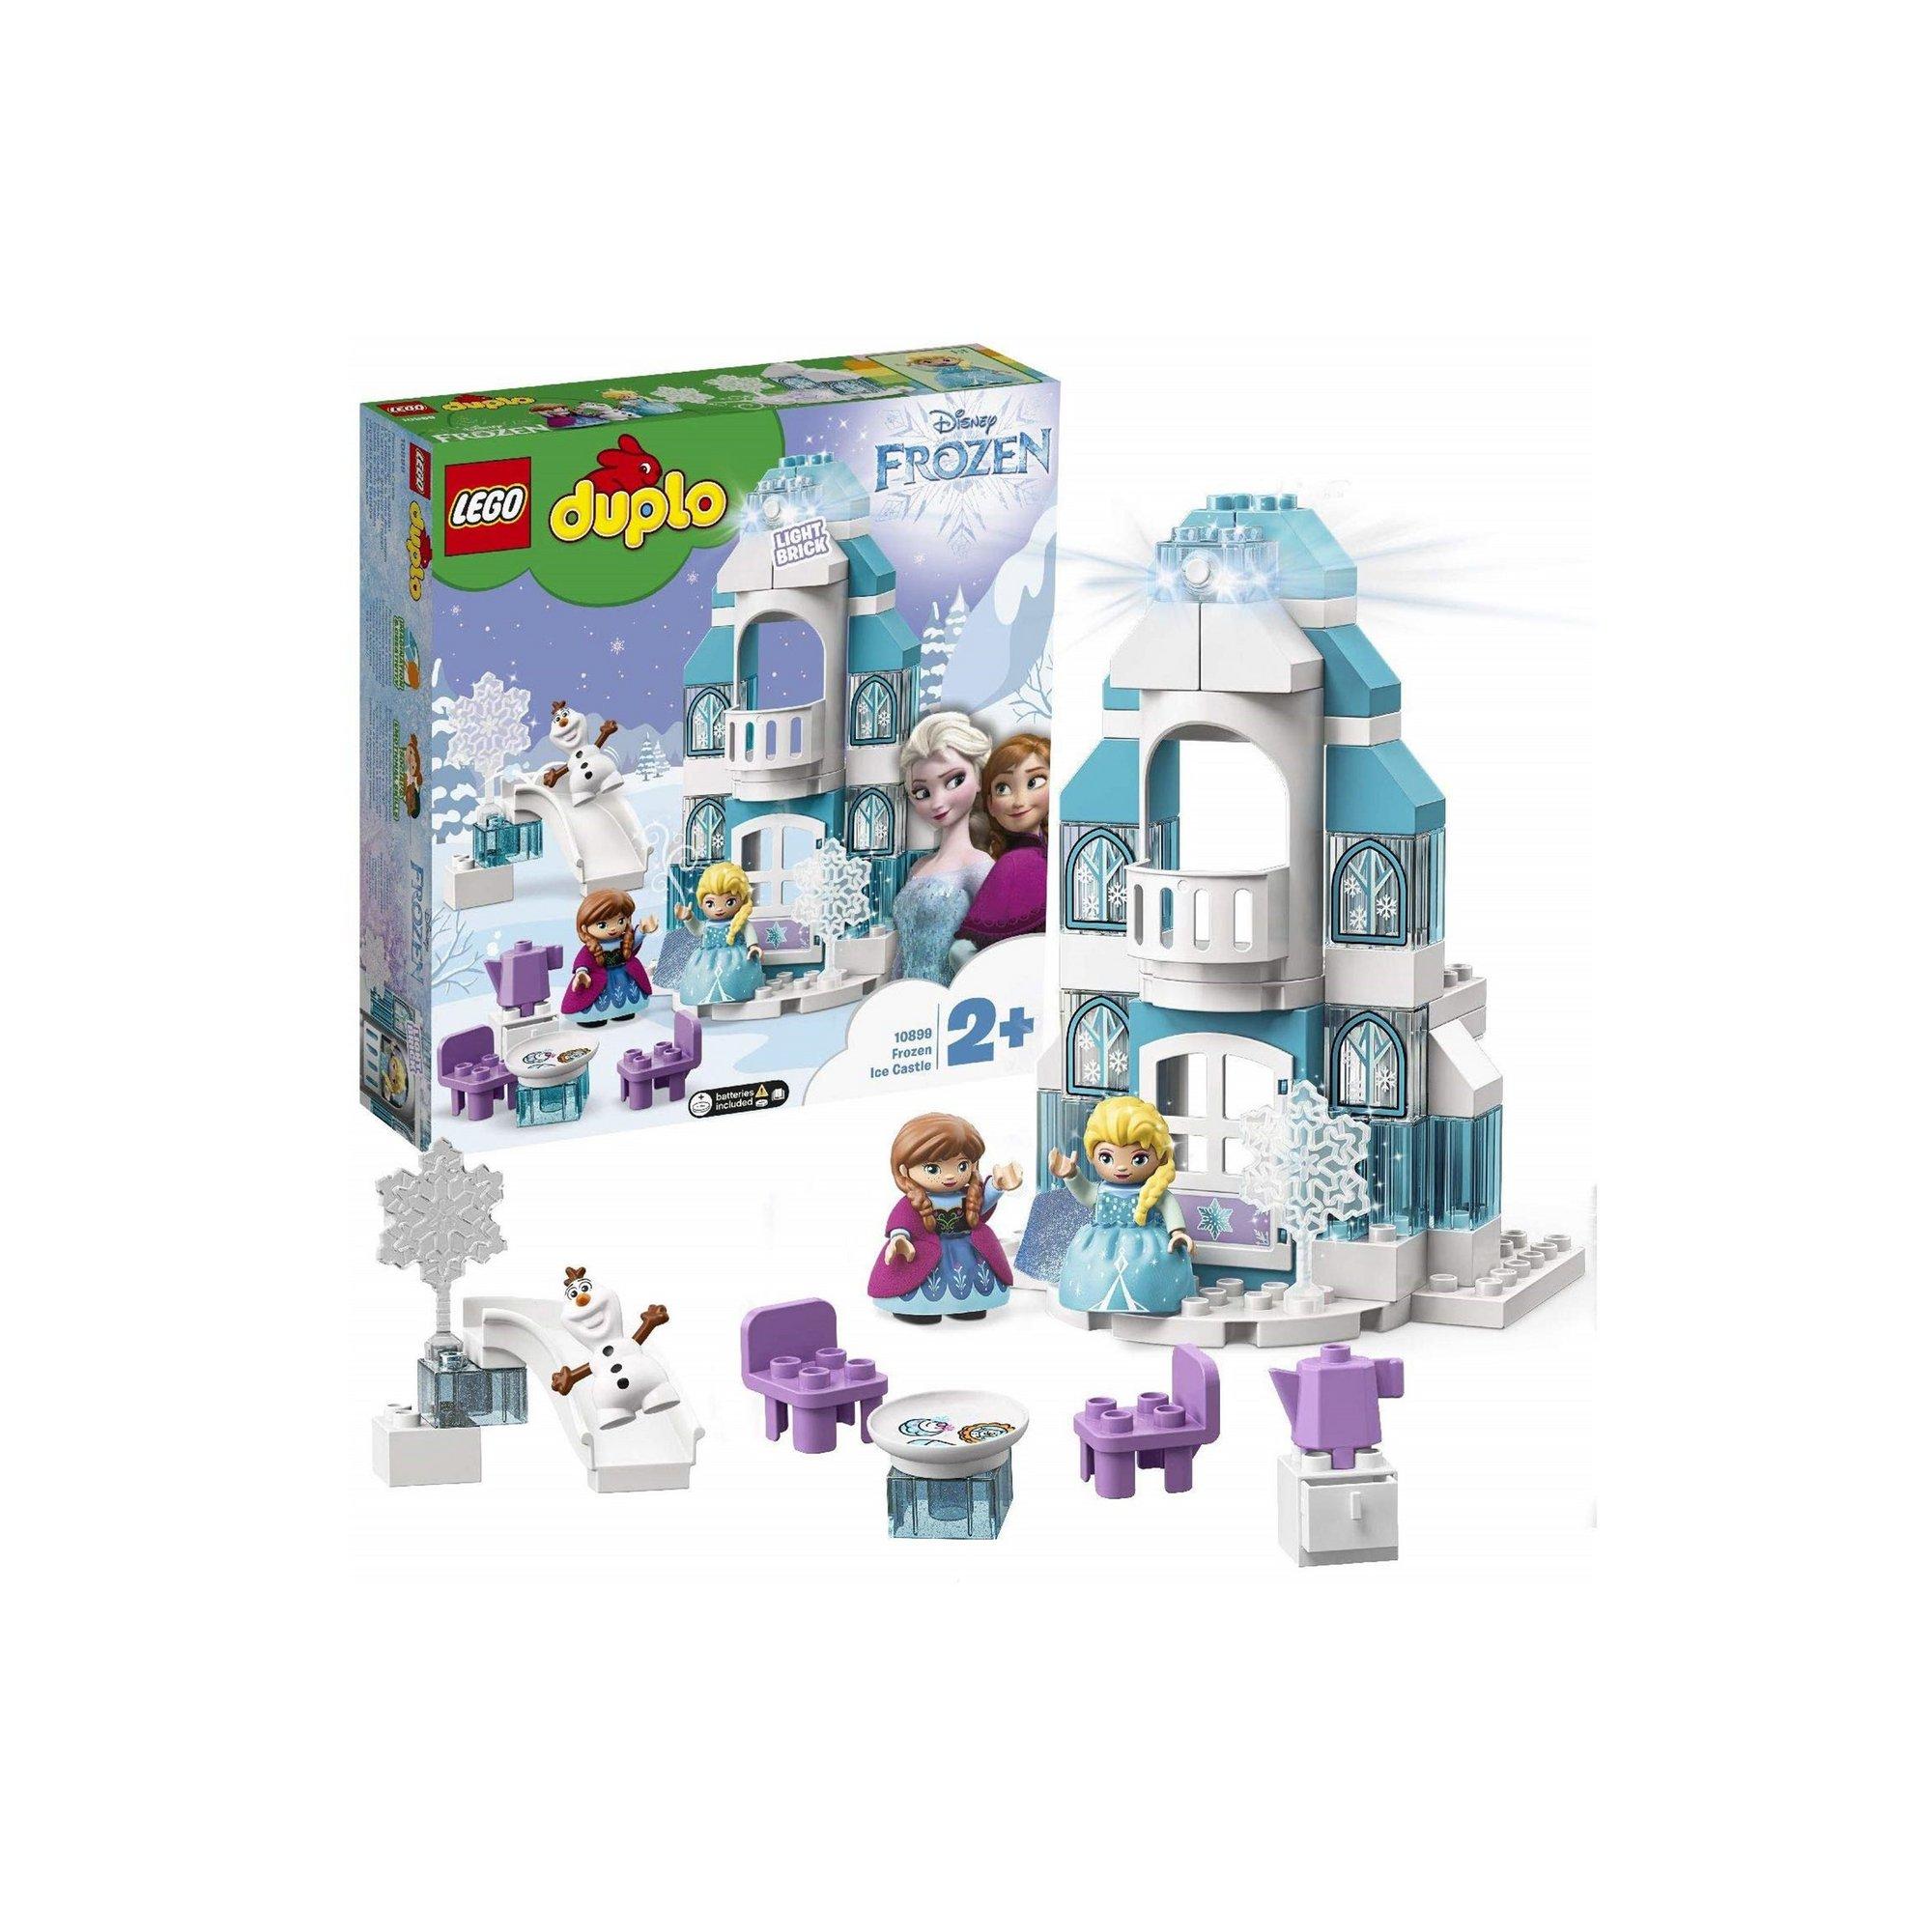 Image of LEGO DUPLO Frozen Ice Castle